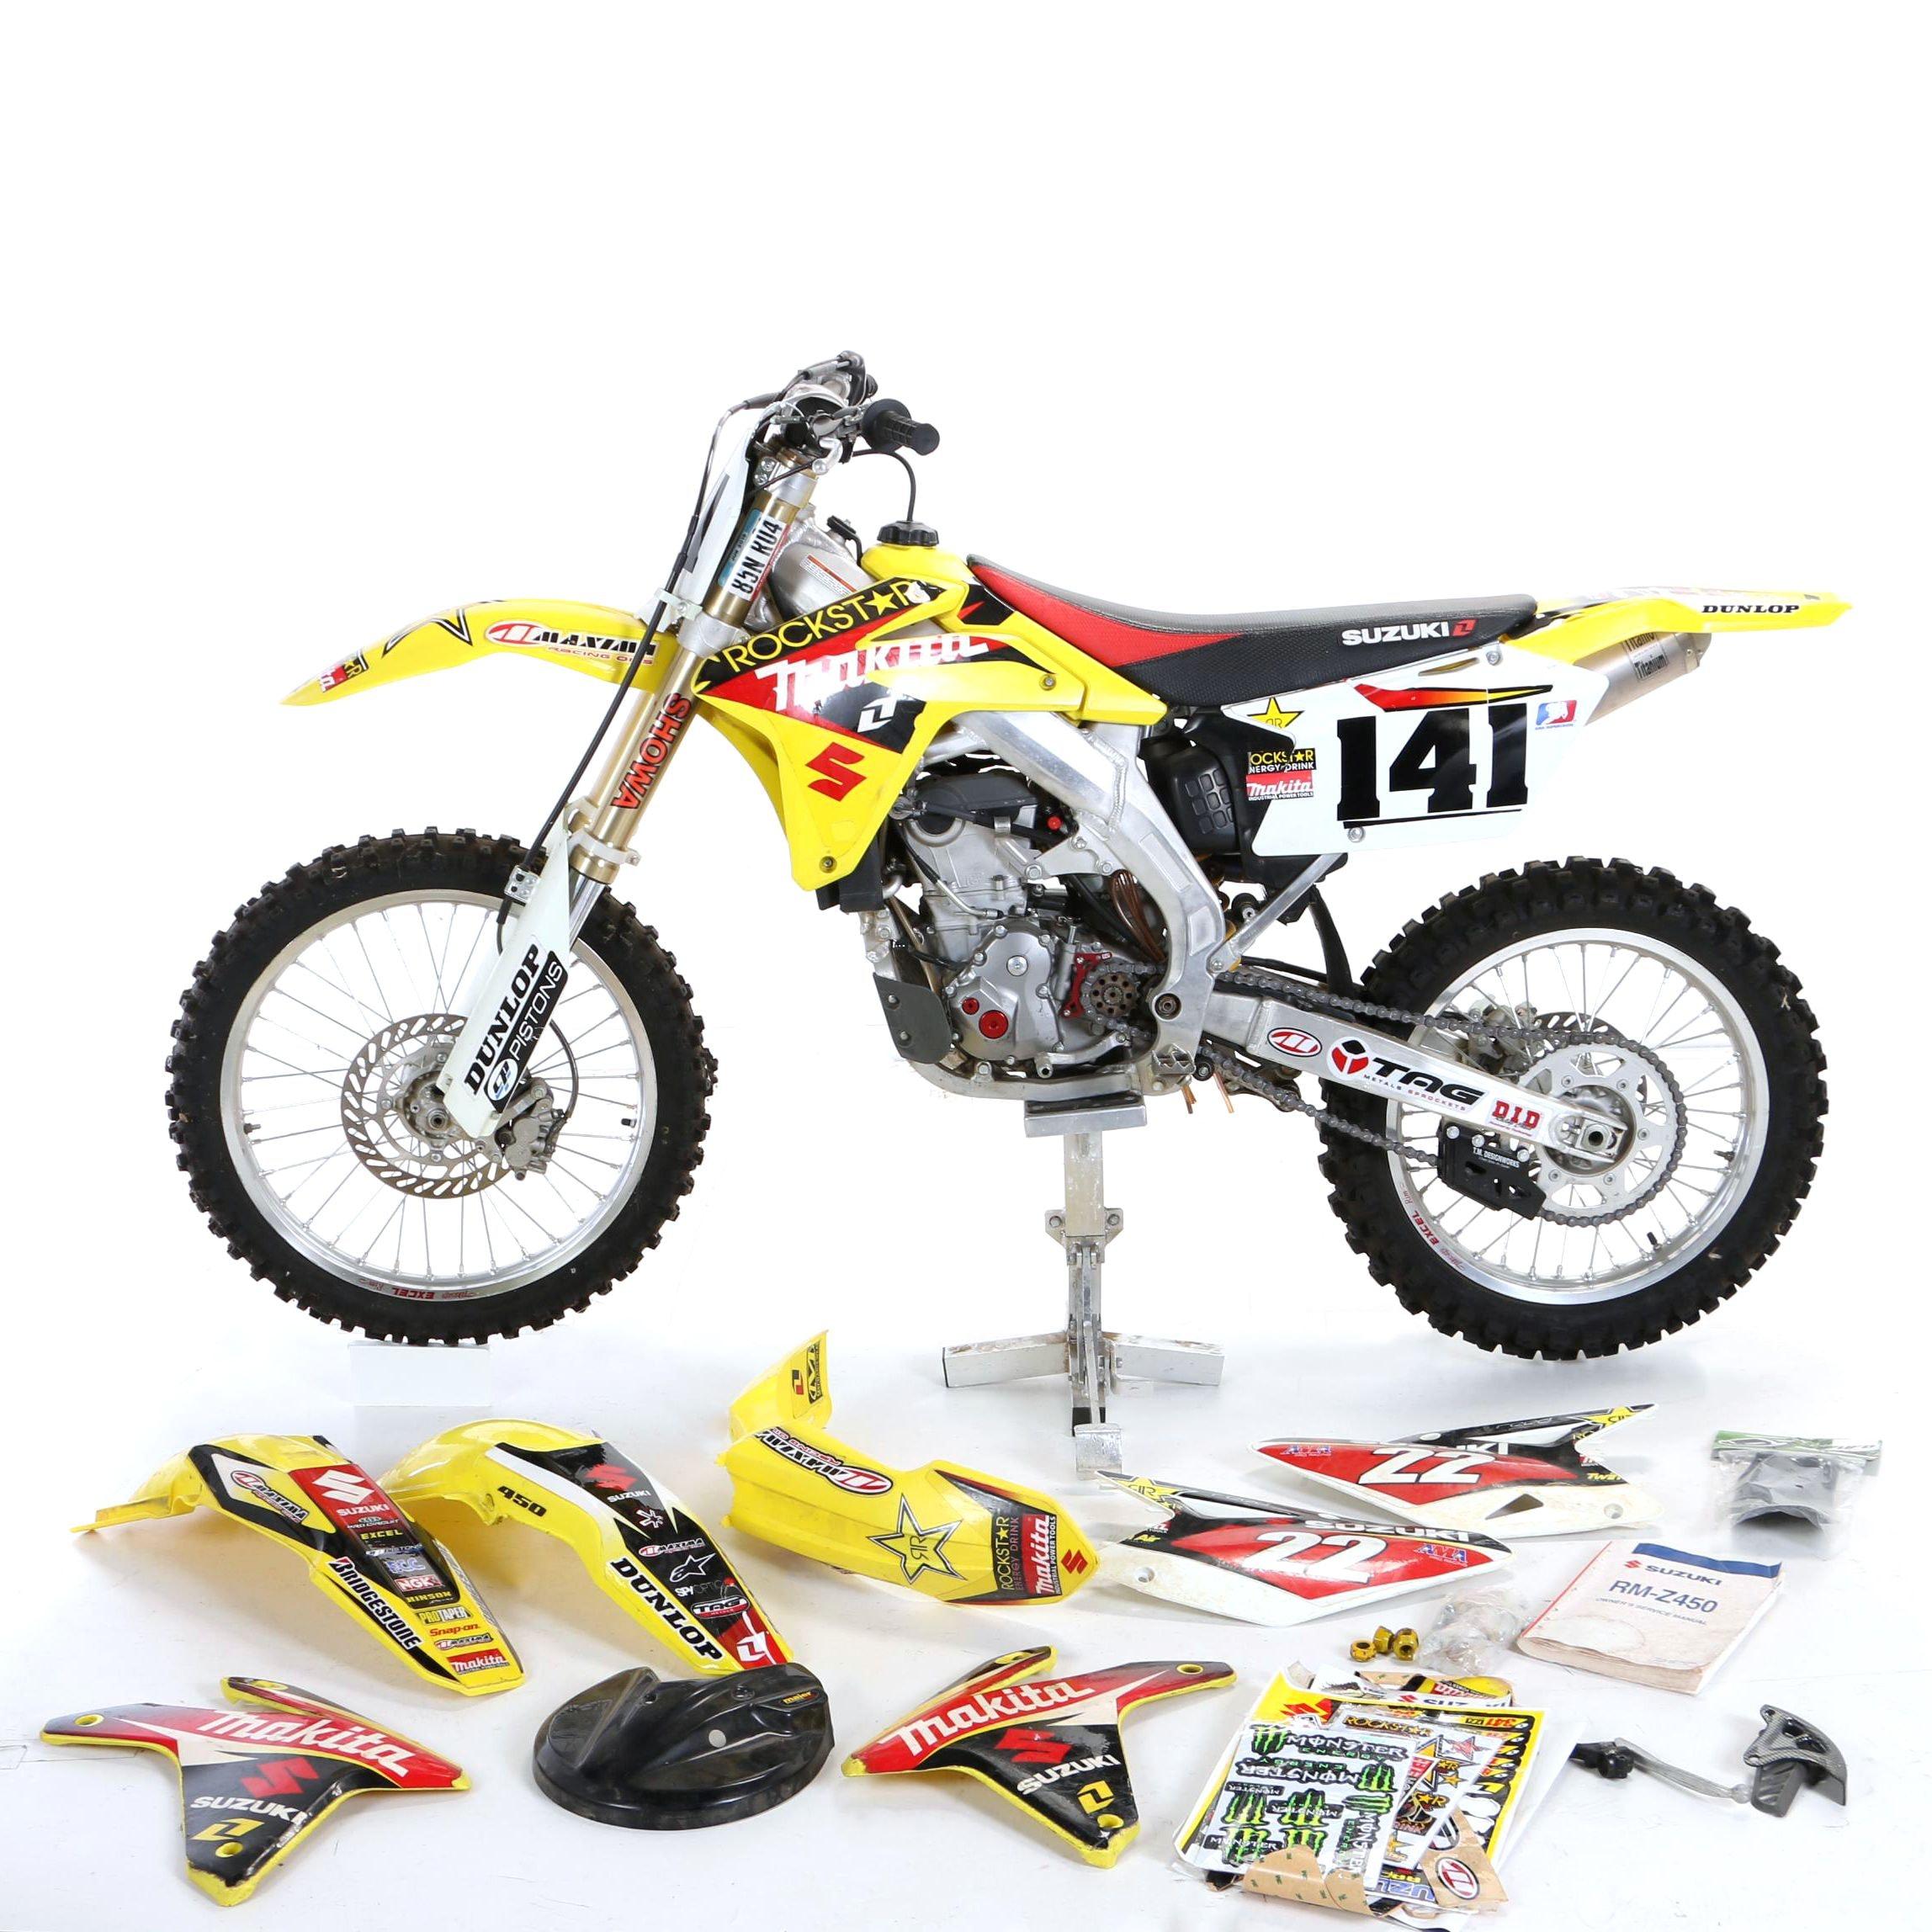 2005 Suzuki RM-Z450 Motocross Motorcycle